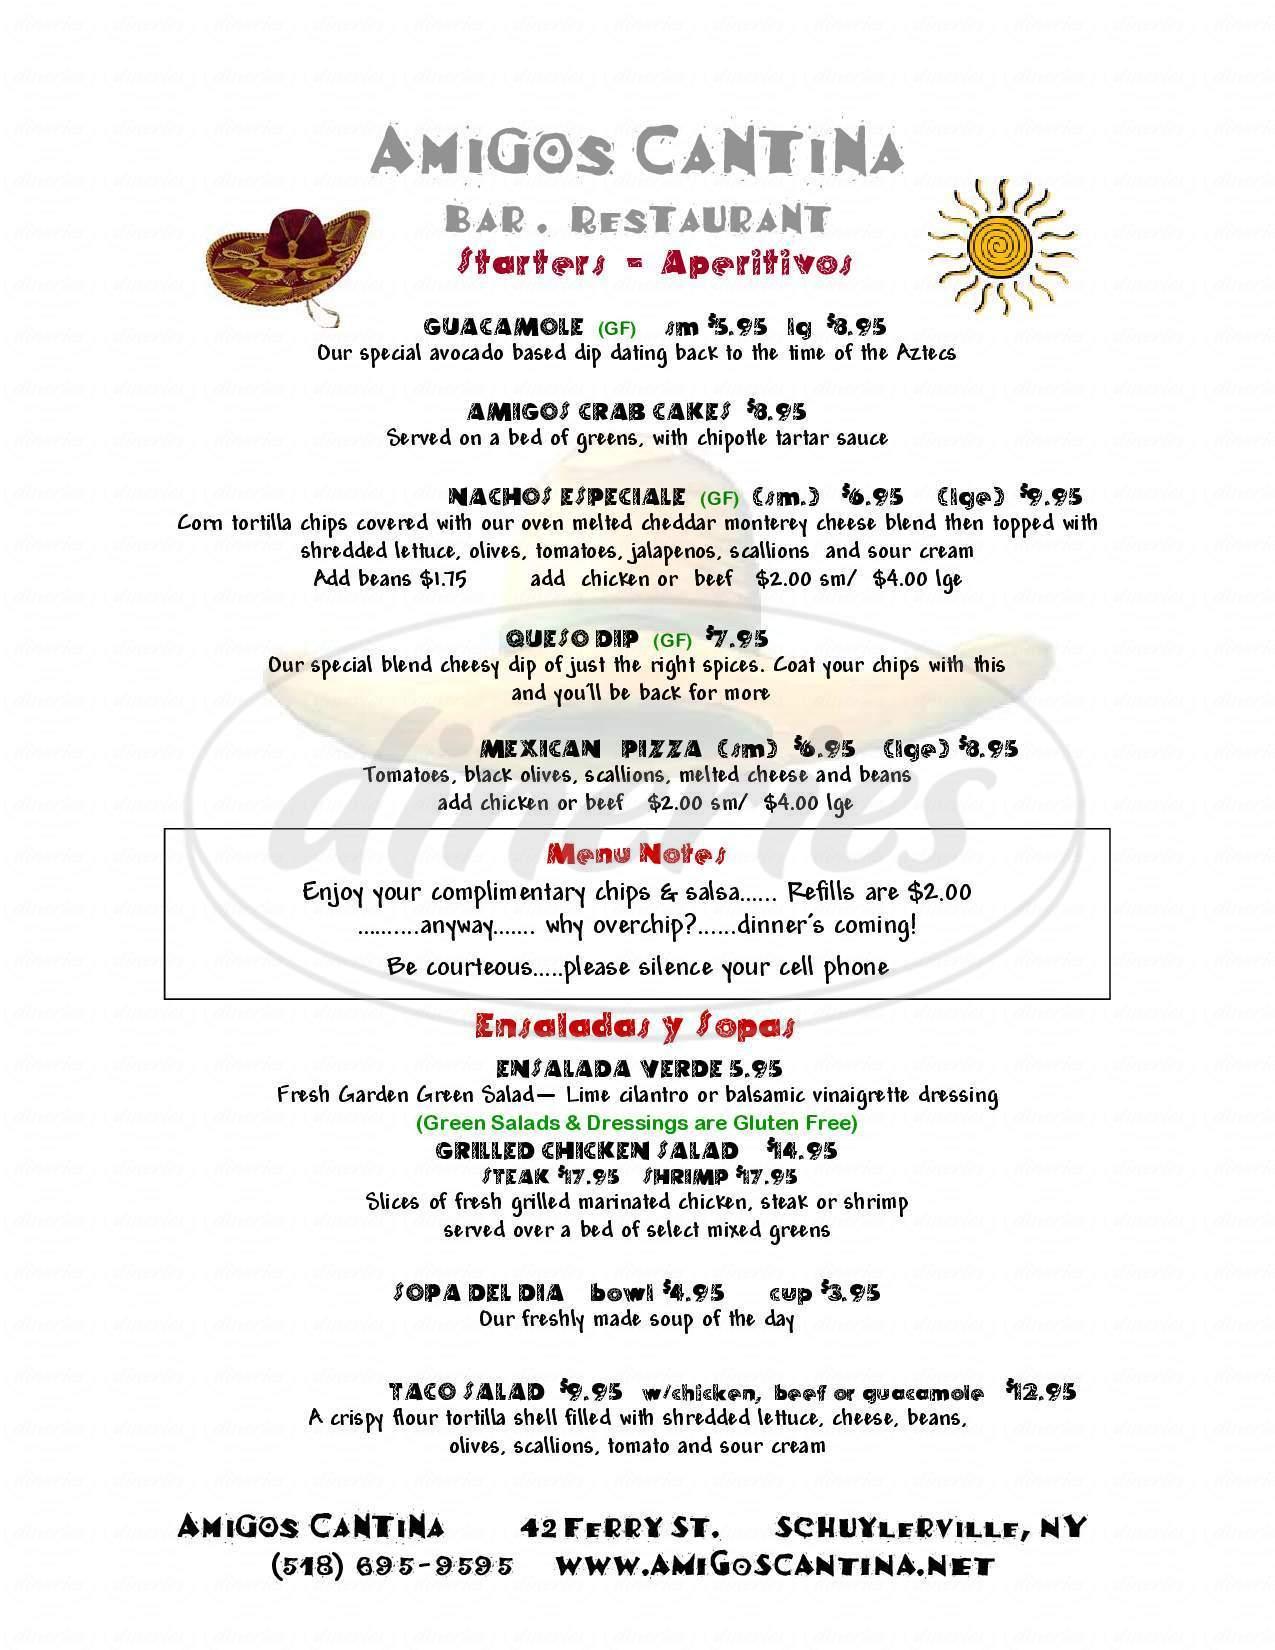 menu for Amigos Cantina